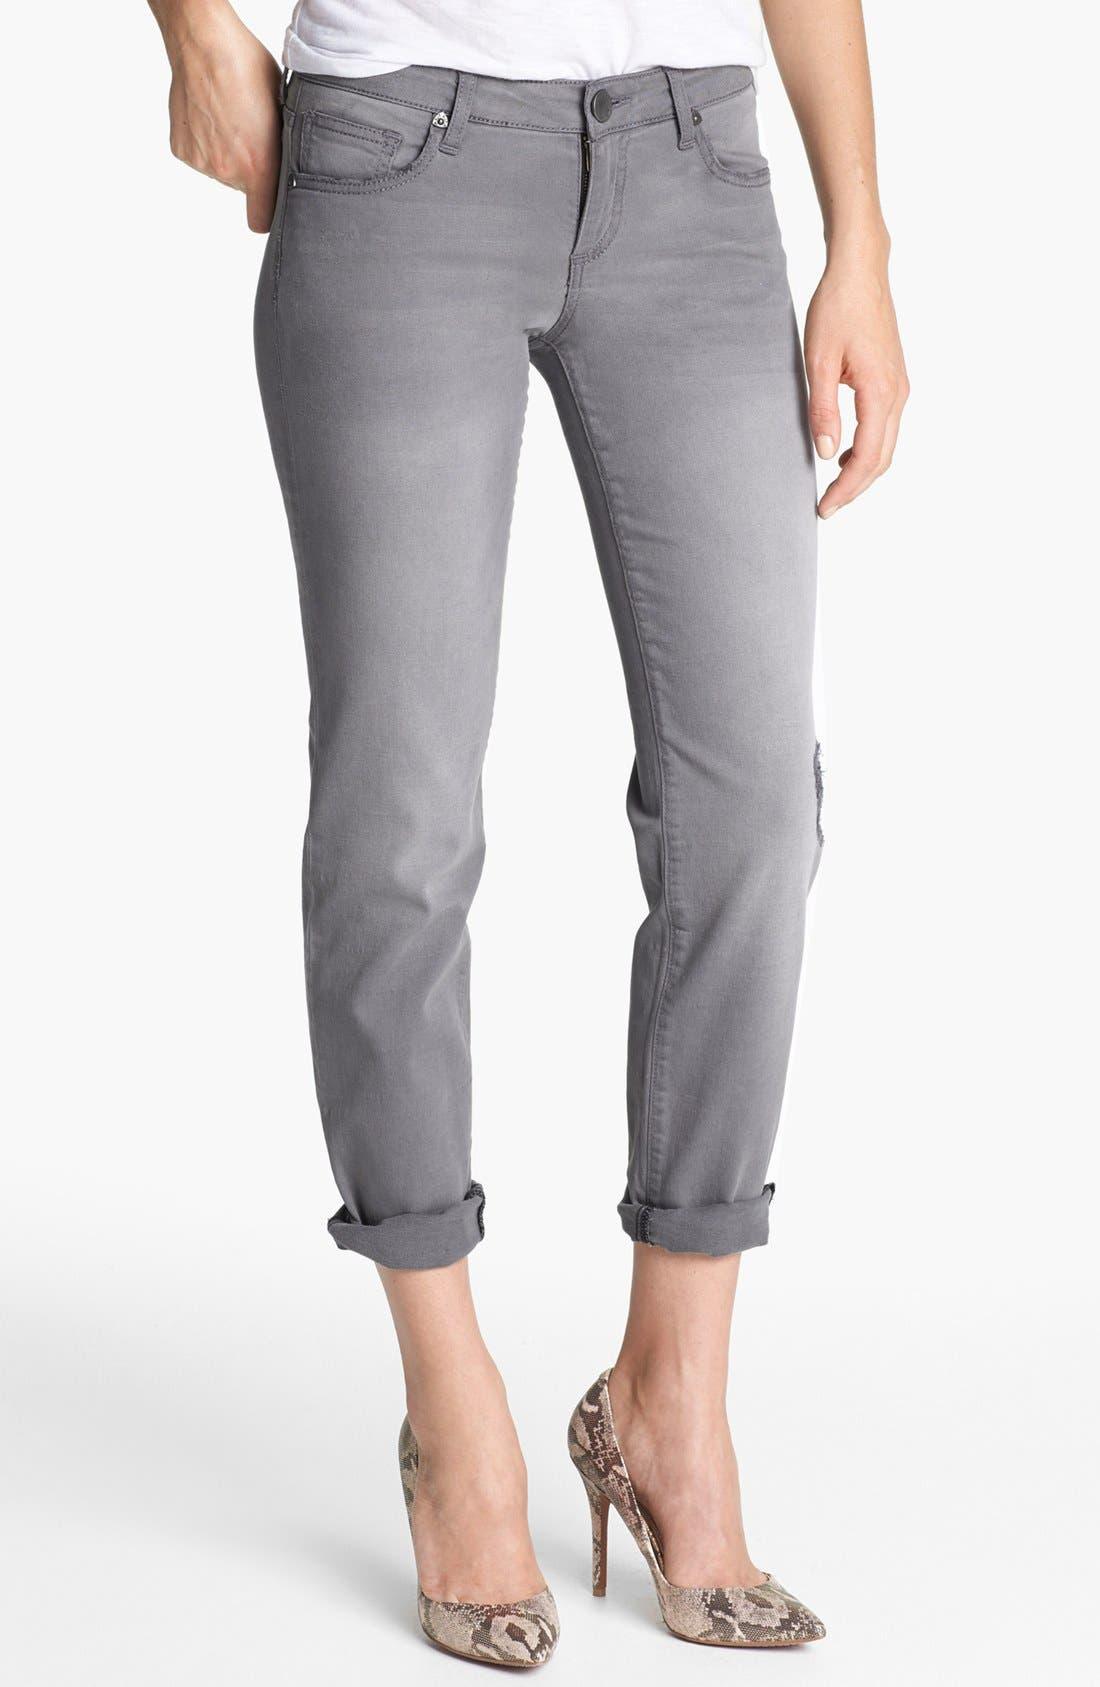 Main Image - KUT from the Kloth Boyfriend Crop Jeans (Ensure)